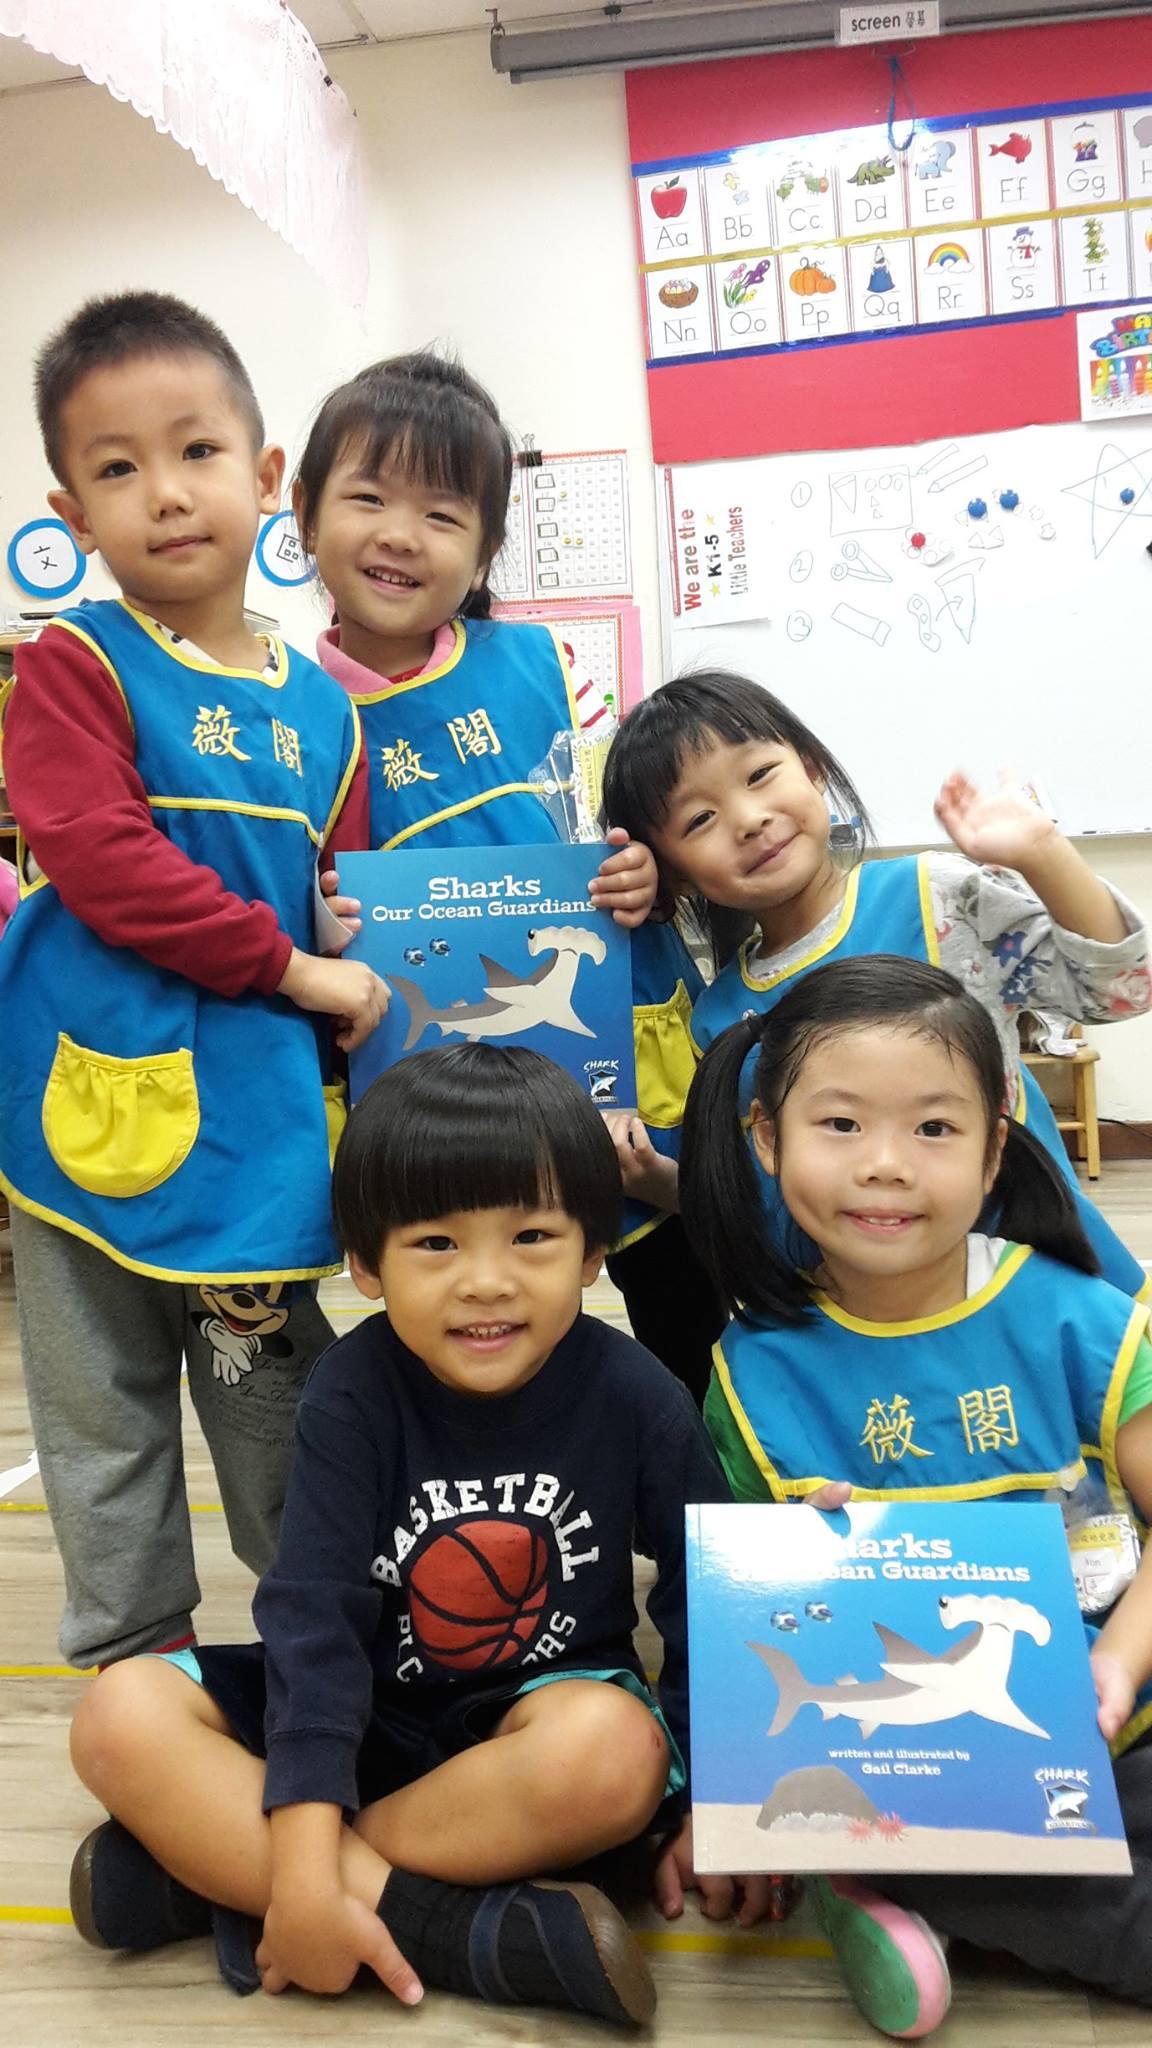 Kids love the Shark book